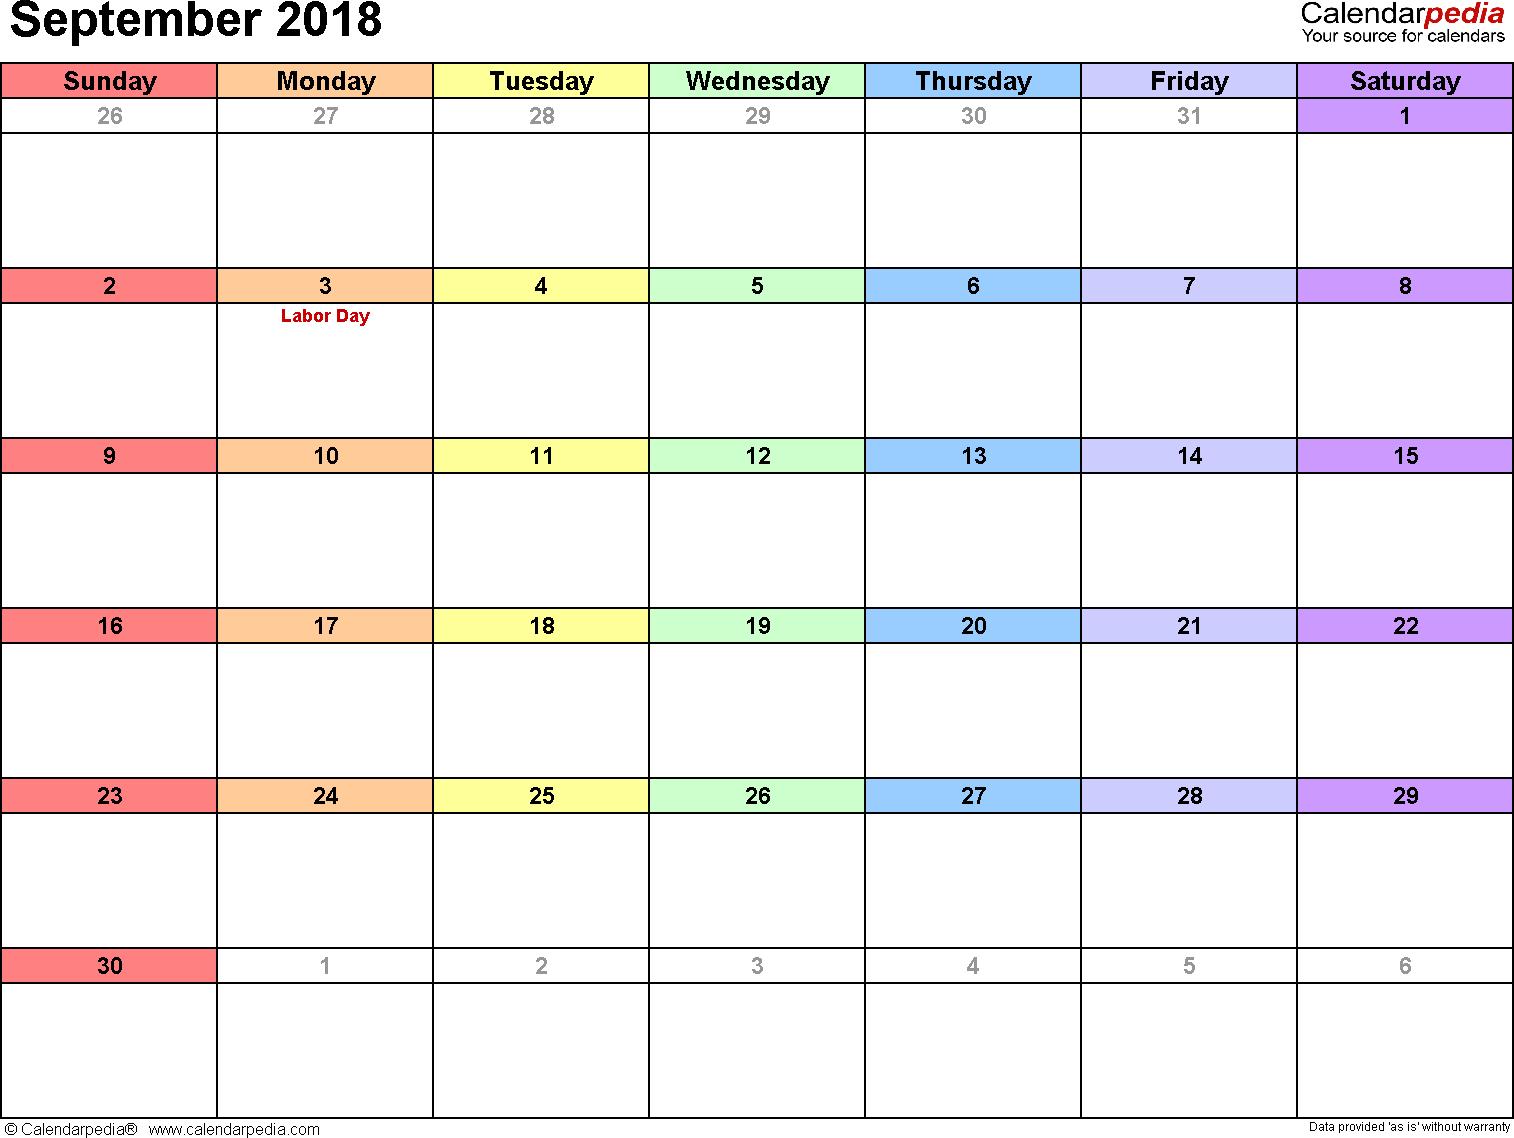 September 2018 calendar, landscape orientation, 'rainbow calendar', available as printable templates for Word, Excel and PDF